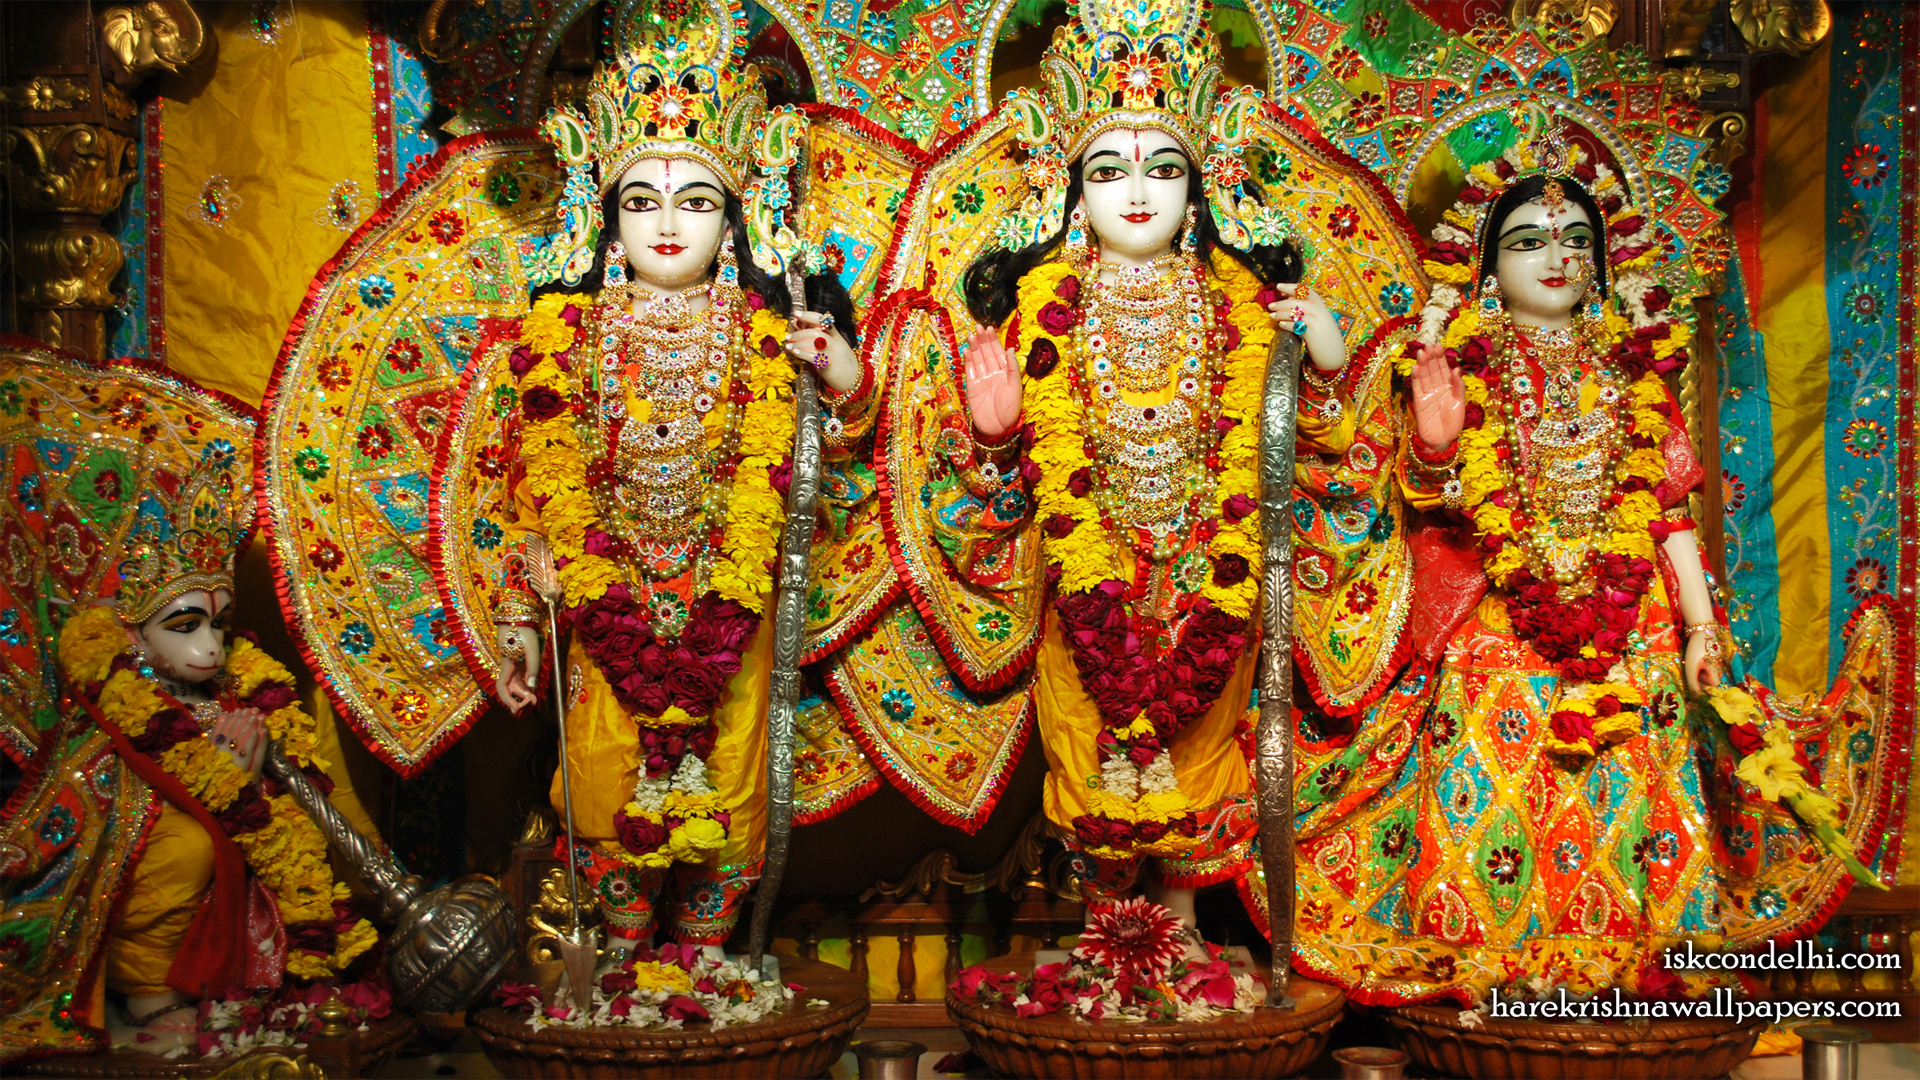 Sri Sri Sita Rama Laxman Hanuman Wallpaper (006) Size 1920x1080 Download